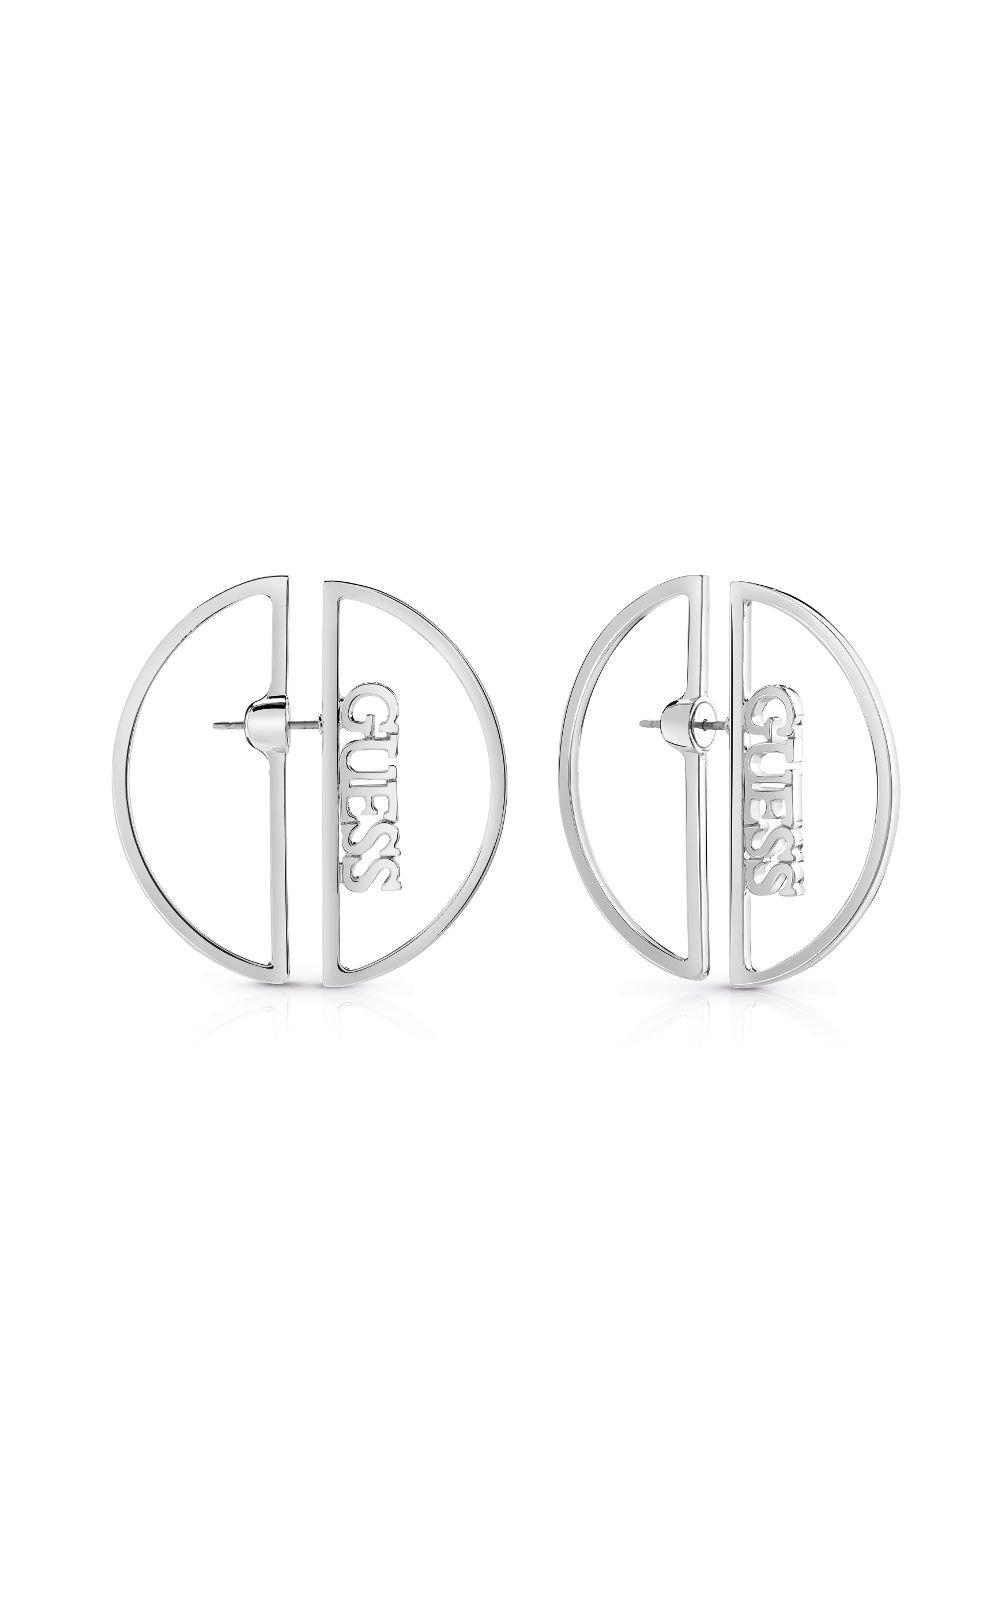 GUESS FAUX UBE84035 Ασημένια Σκουλαρίκια Με Λογότυπο